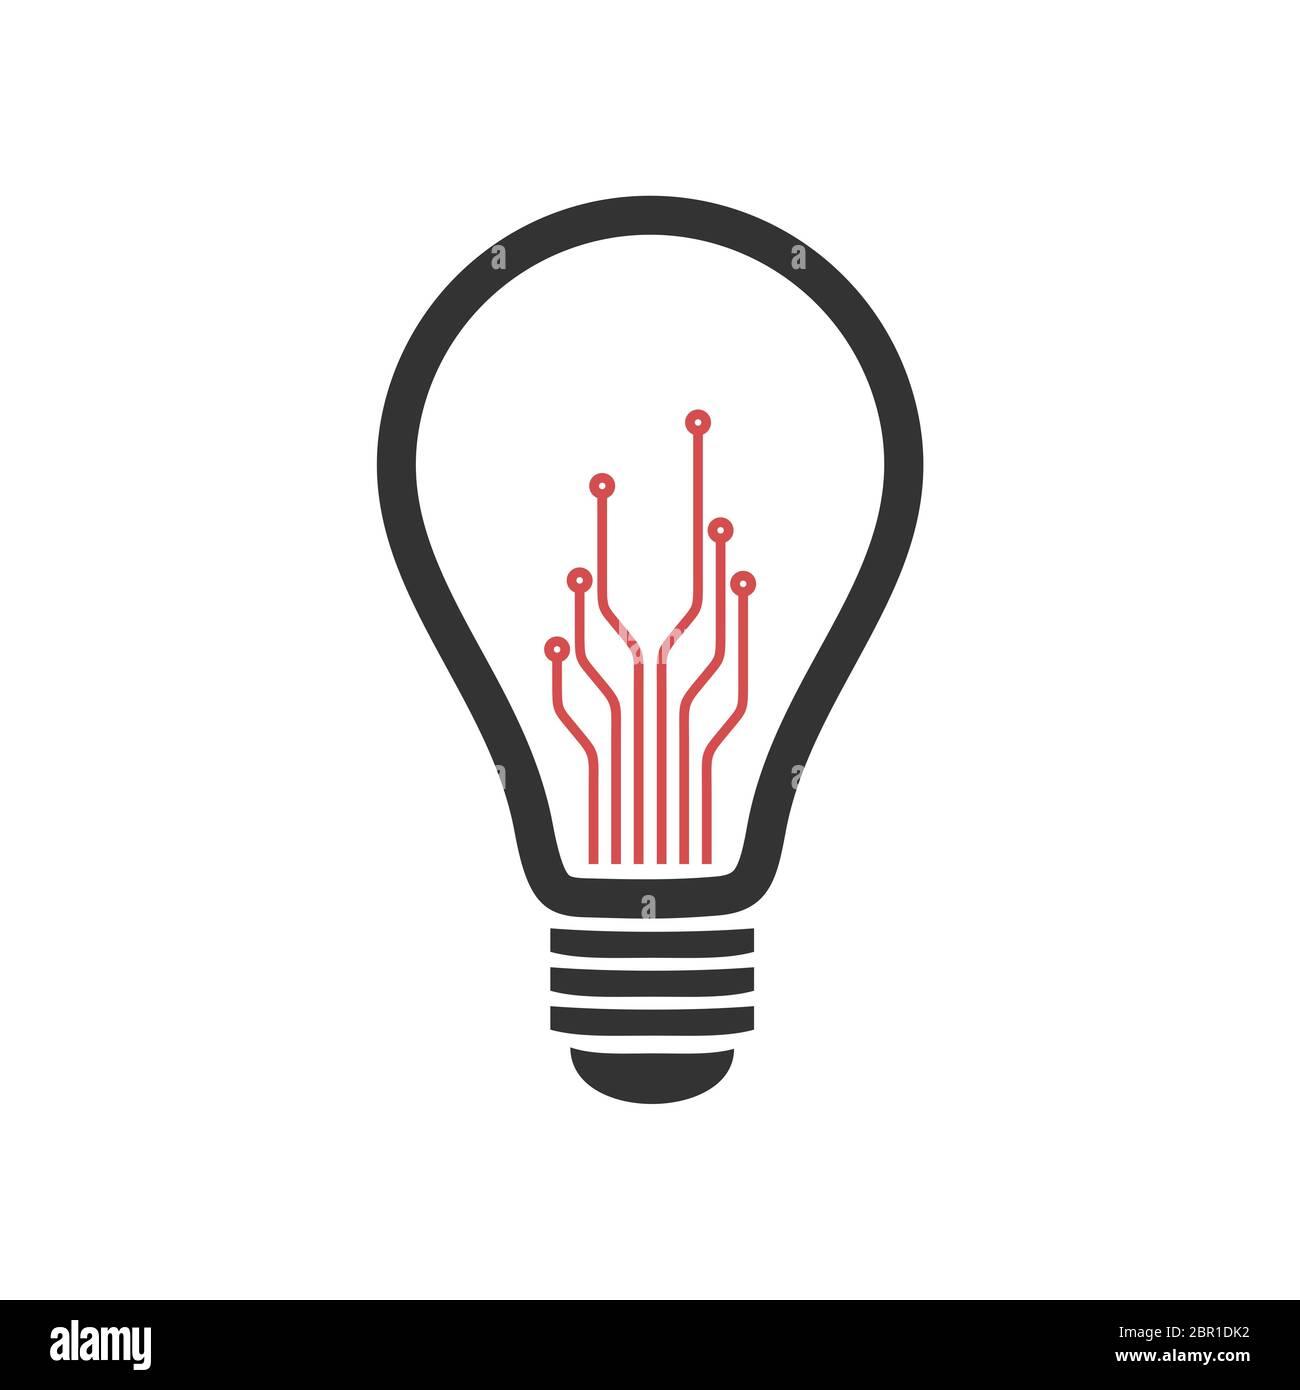 images?q=tbn:ANd9GcQh_l3eQ5xwiPy07kGEXjmjgmBKBRB7H2mRxCGhv1tFWg5c_mWT Circuit Diagram Symbols Bulb